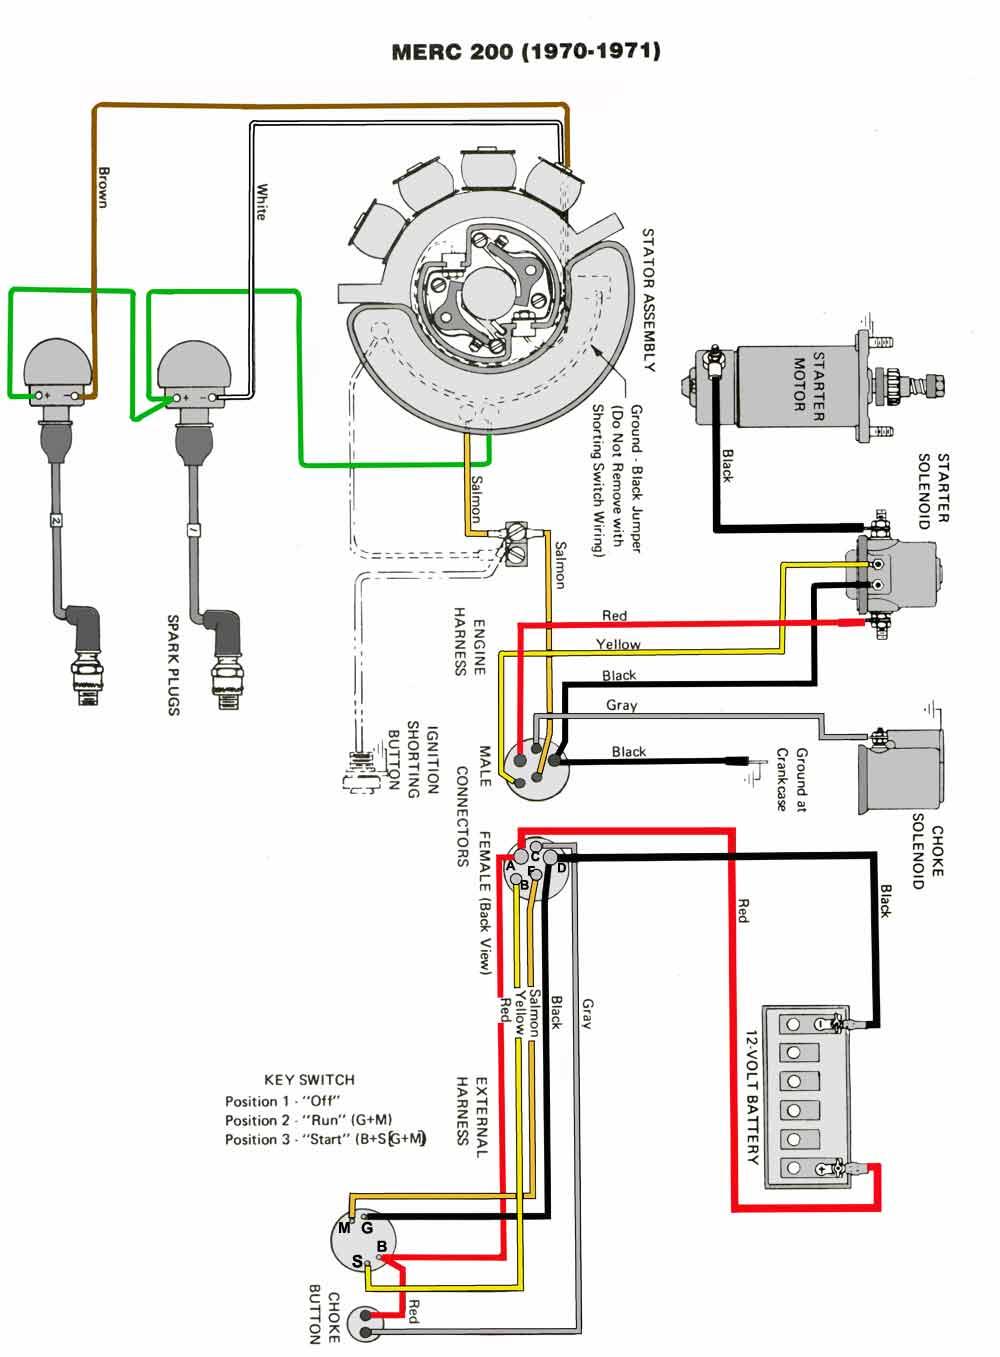 90hp mercury marine wiring diagram 2014 [ 1000 x 1357 Pixel ]